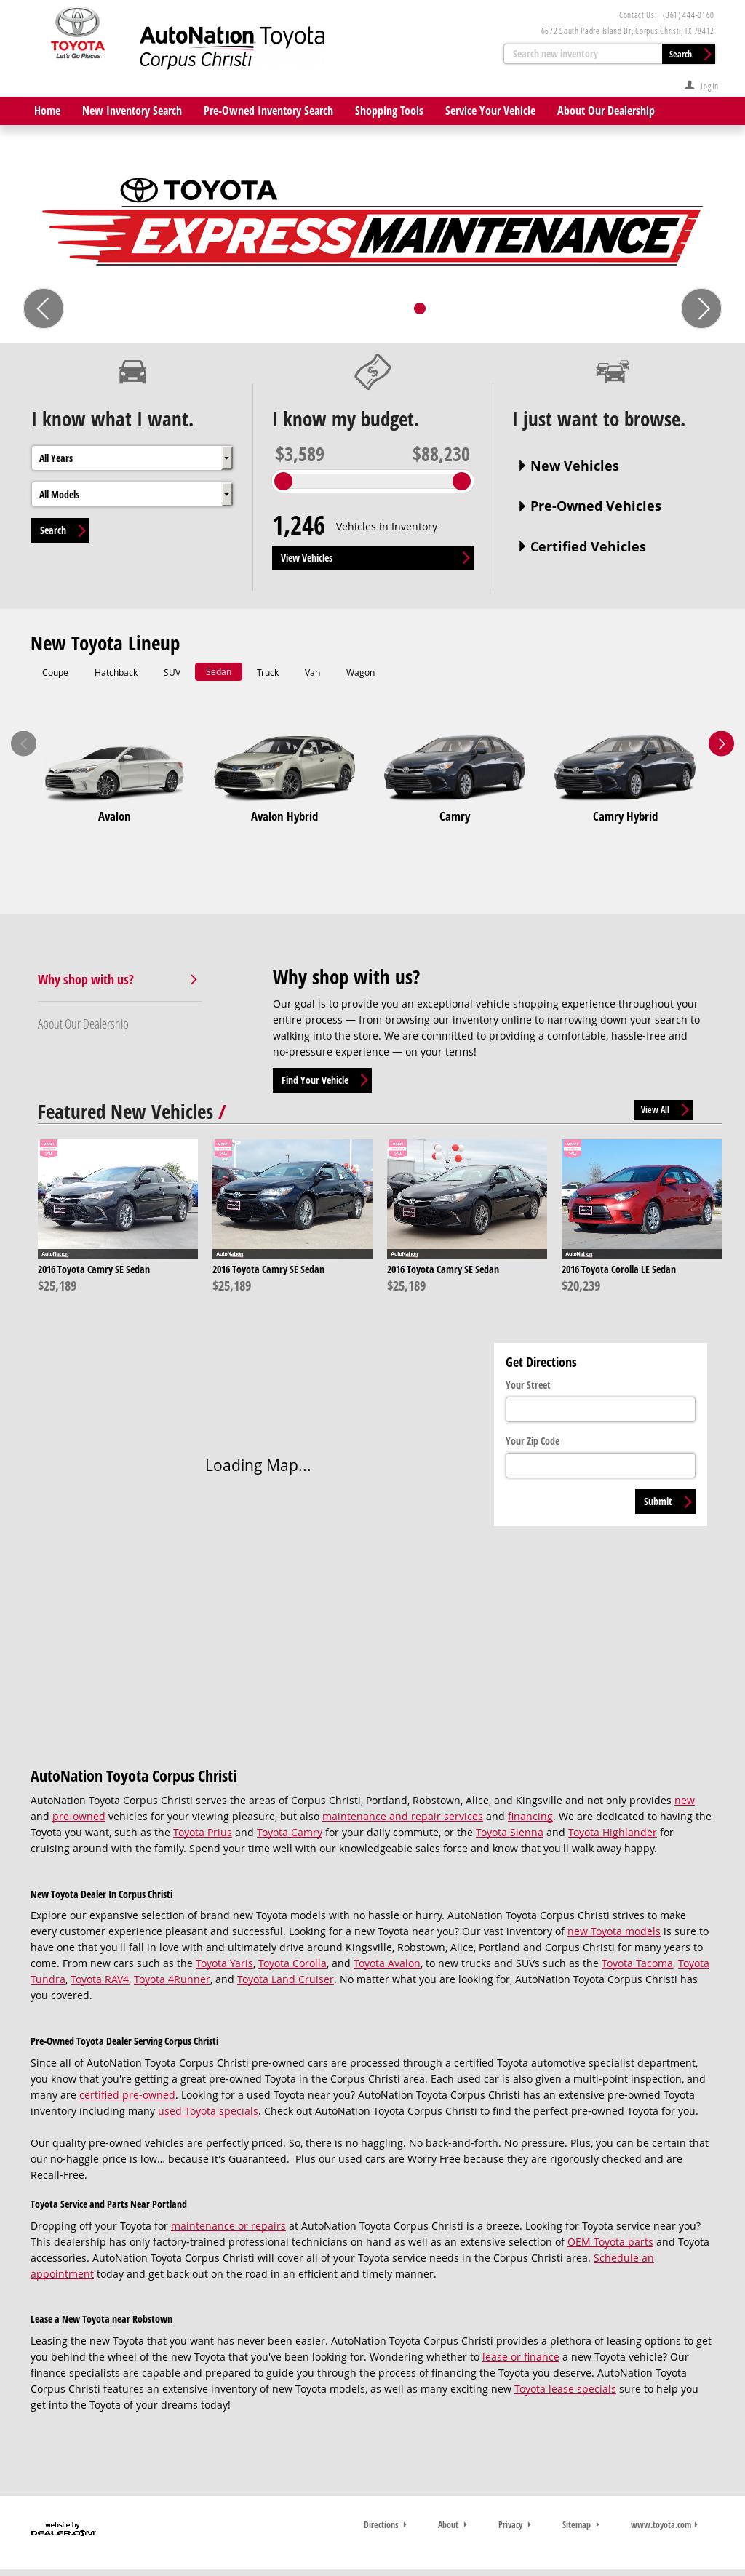 Autonation Toyota Scion Corpus Christi petitors Revenue and